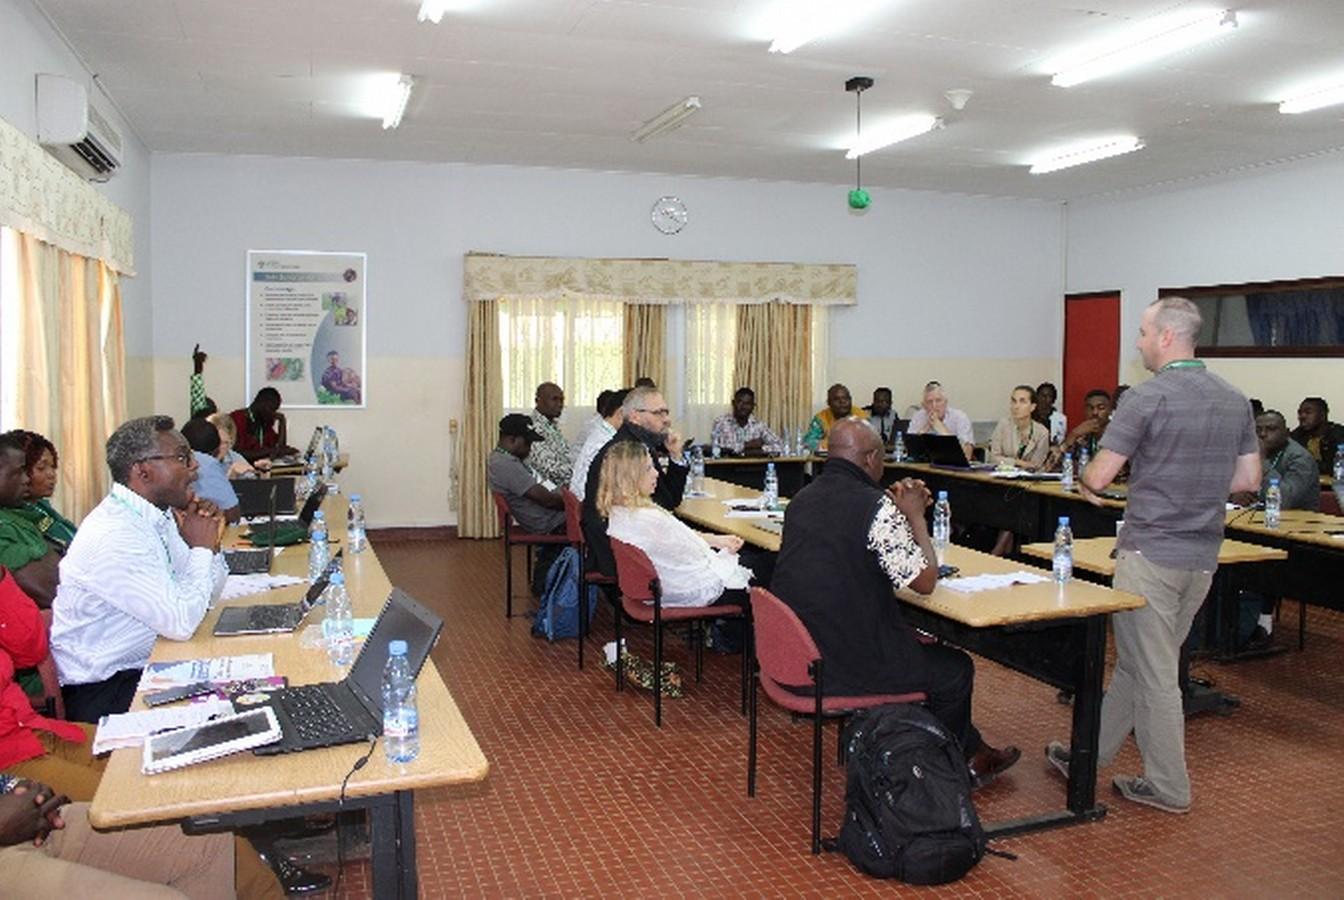 natconbio-workshop-resolving-conservation-conflicts-02